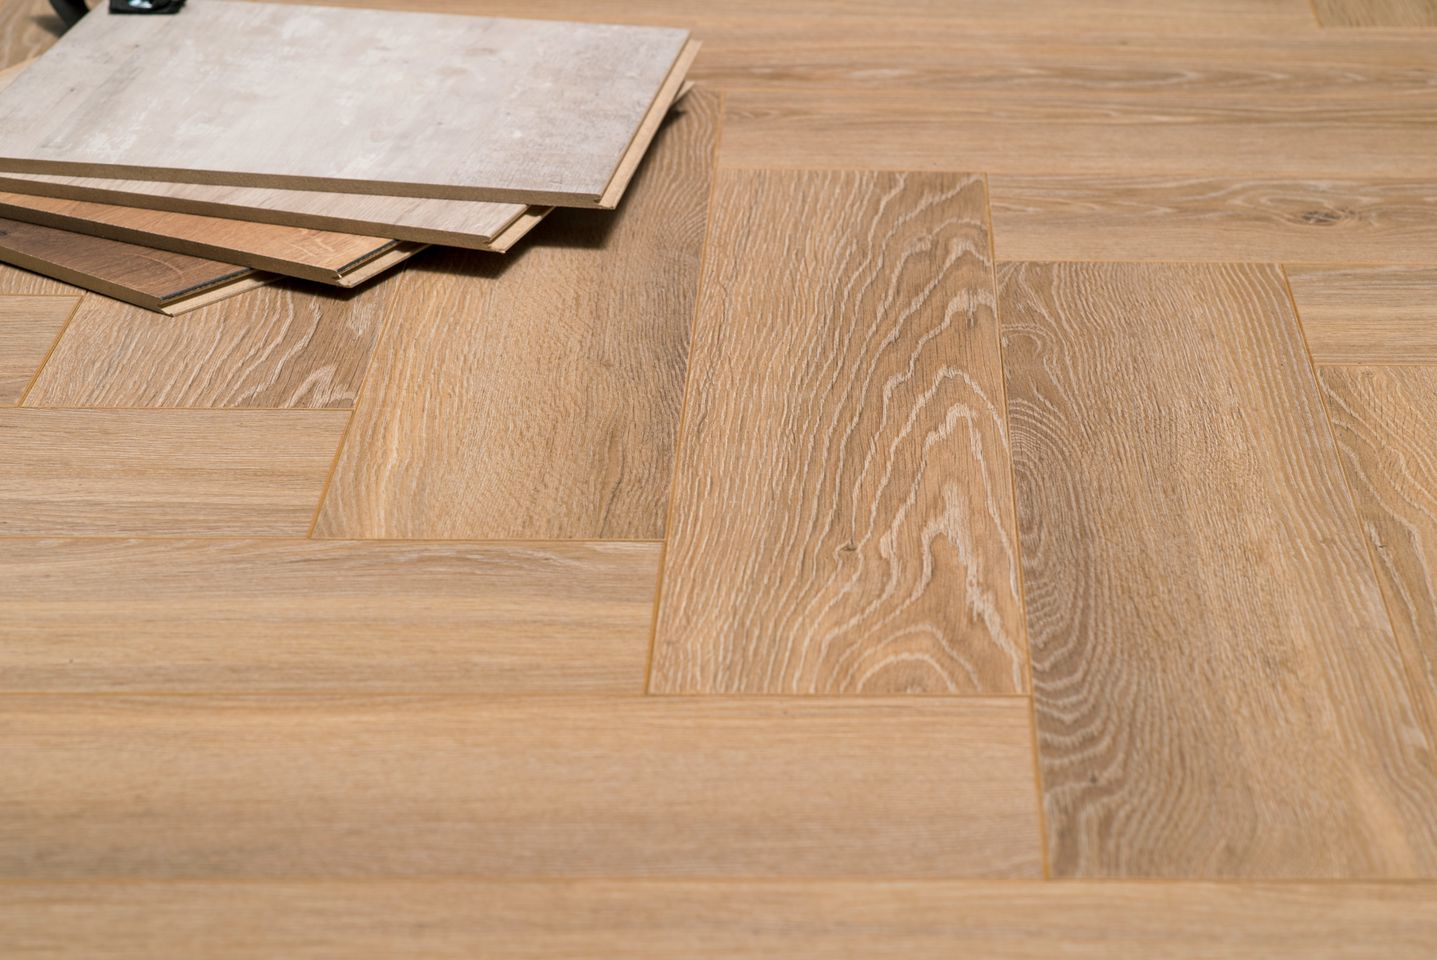 Visgraat Laminaat Leggen : Floer visgraat laminaat natuur eiken vloer patroon eik bruin